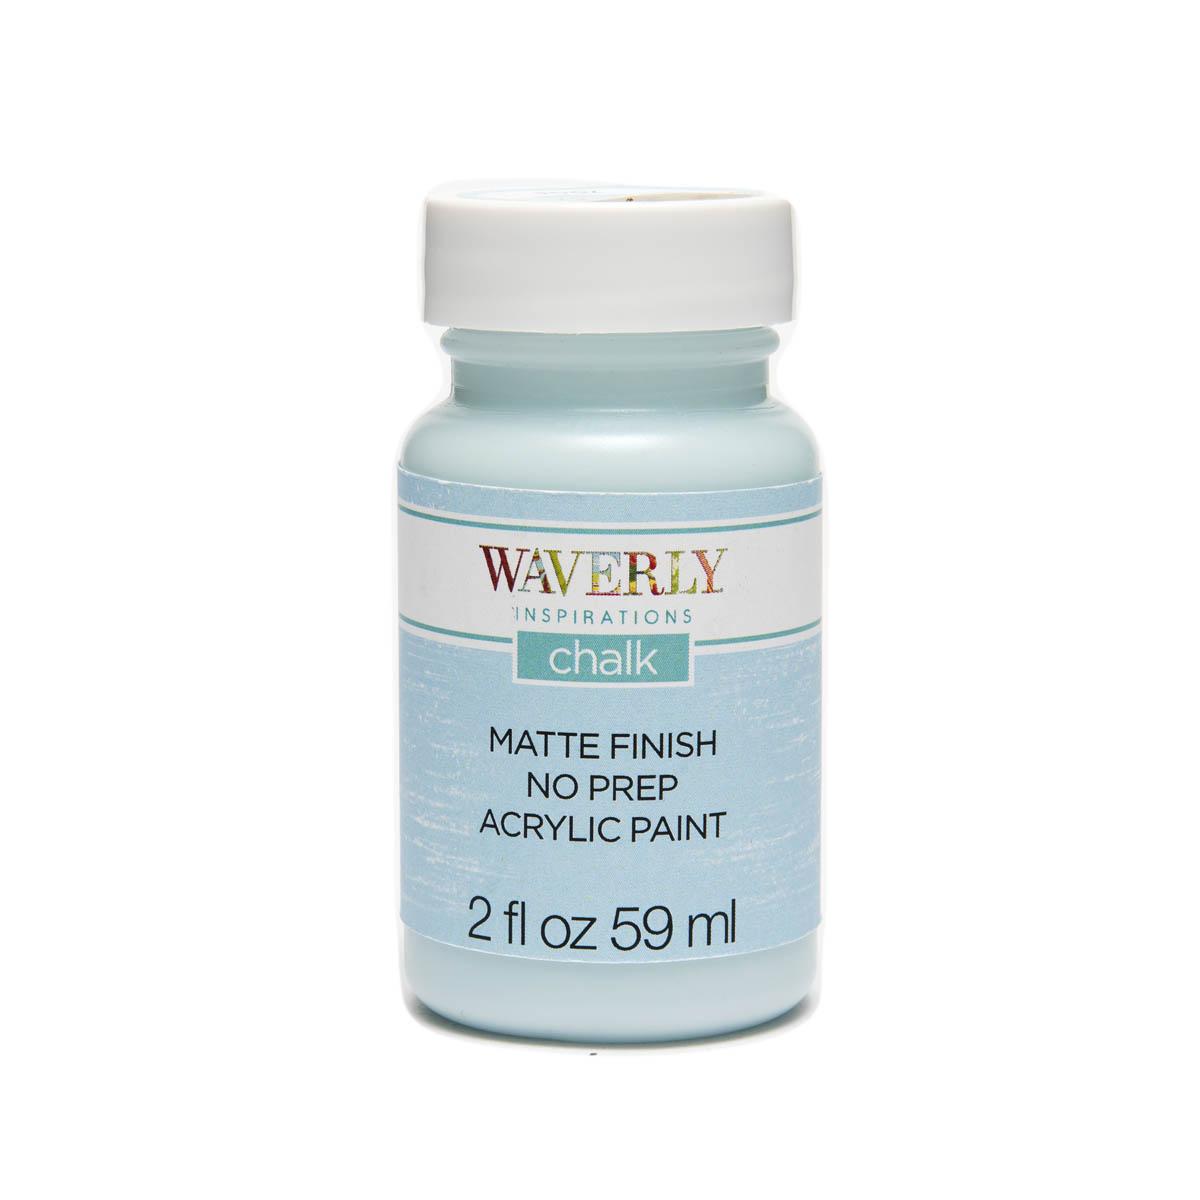 Waverly ® Inspirations Chalk Finish Acrylic Paint - Pool, 2 oz. - 60887E